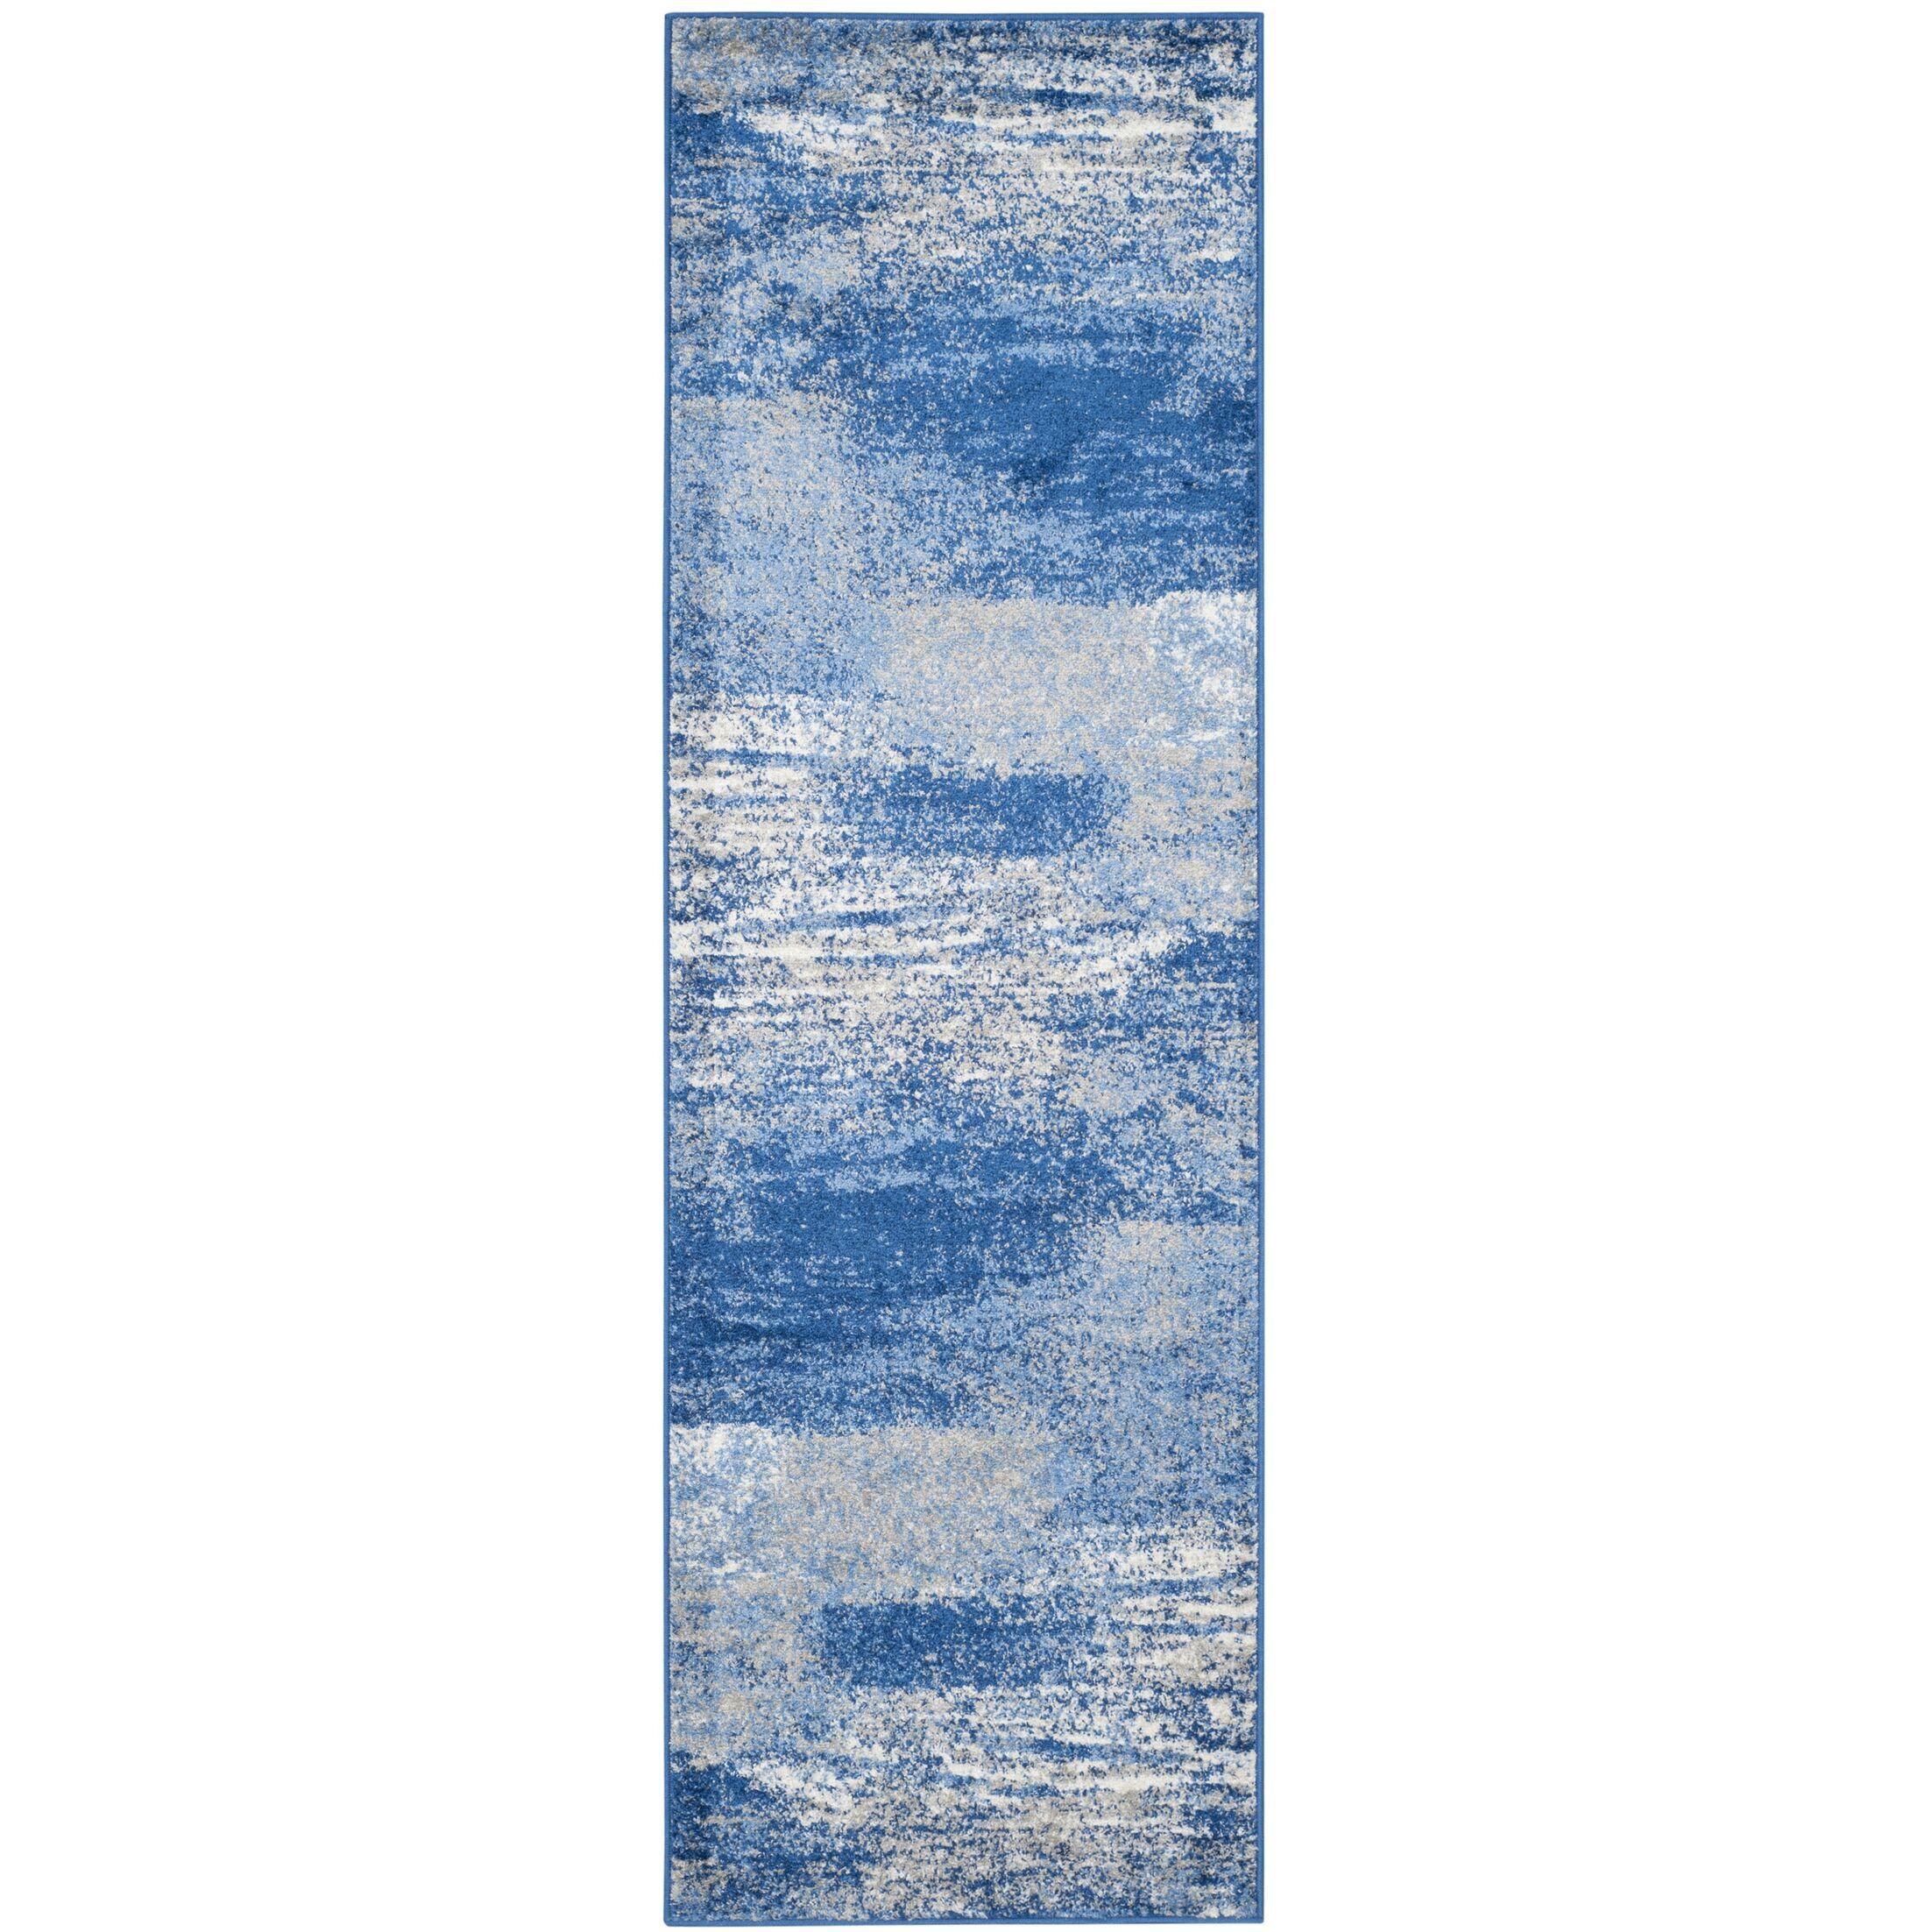 Costa Mesa Silver/Blue Area Rug Rug Size: Runner 2'6